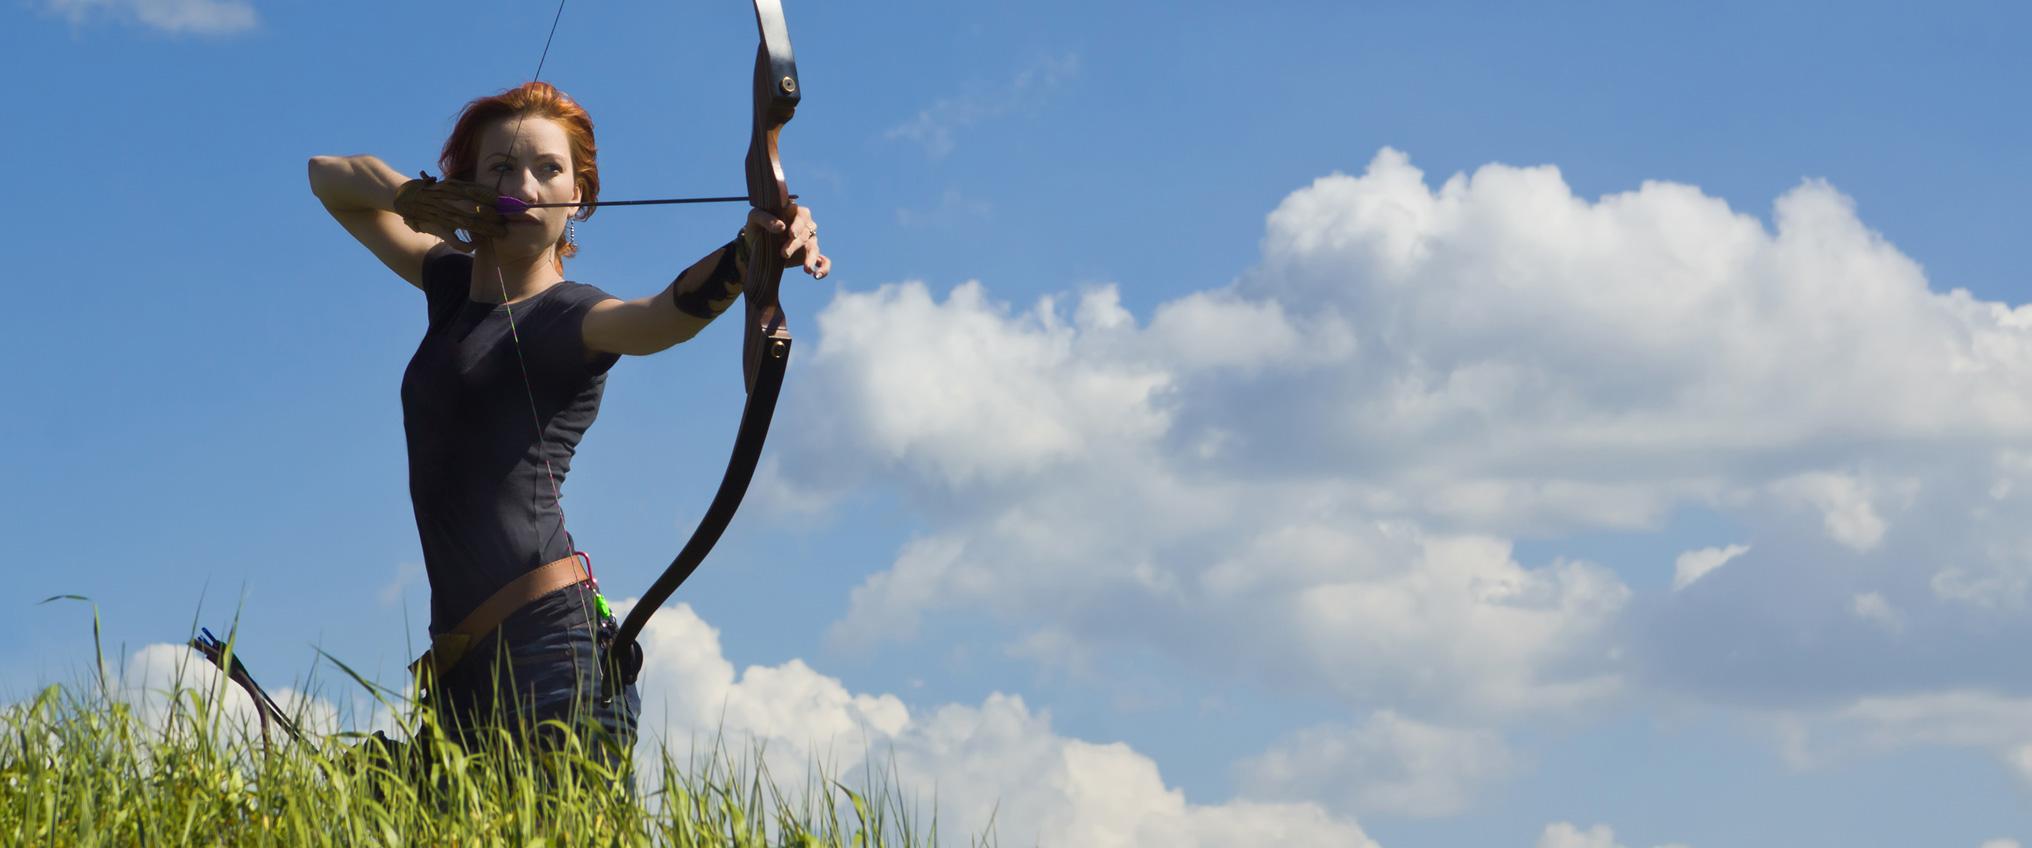 Archery Training, Equipment, & Range | Longmont, CO | Archery in the